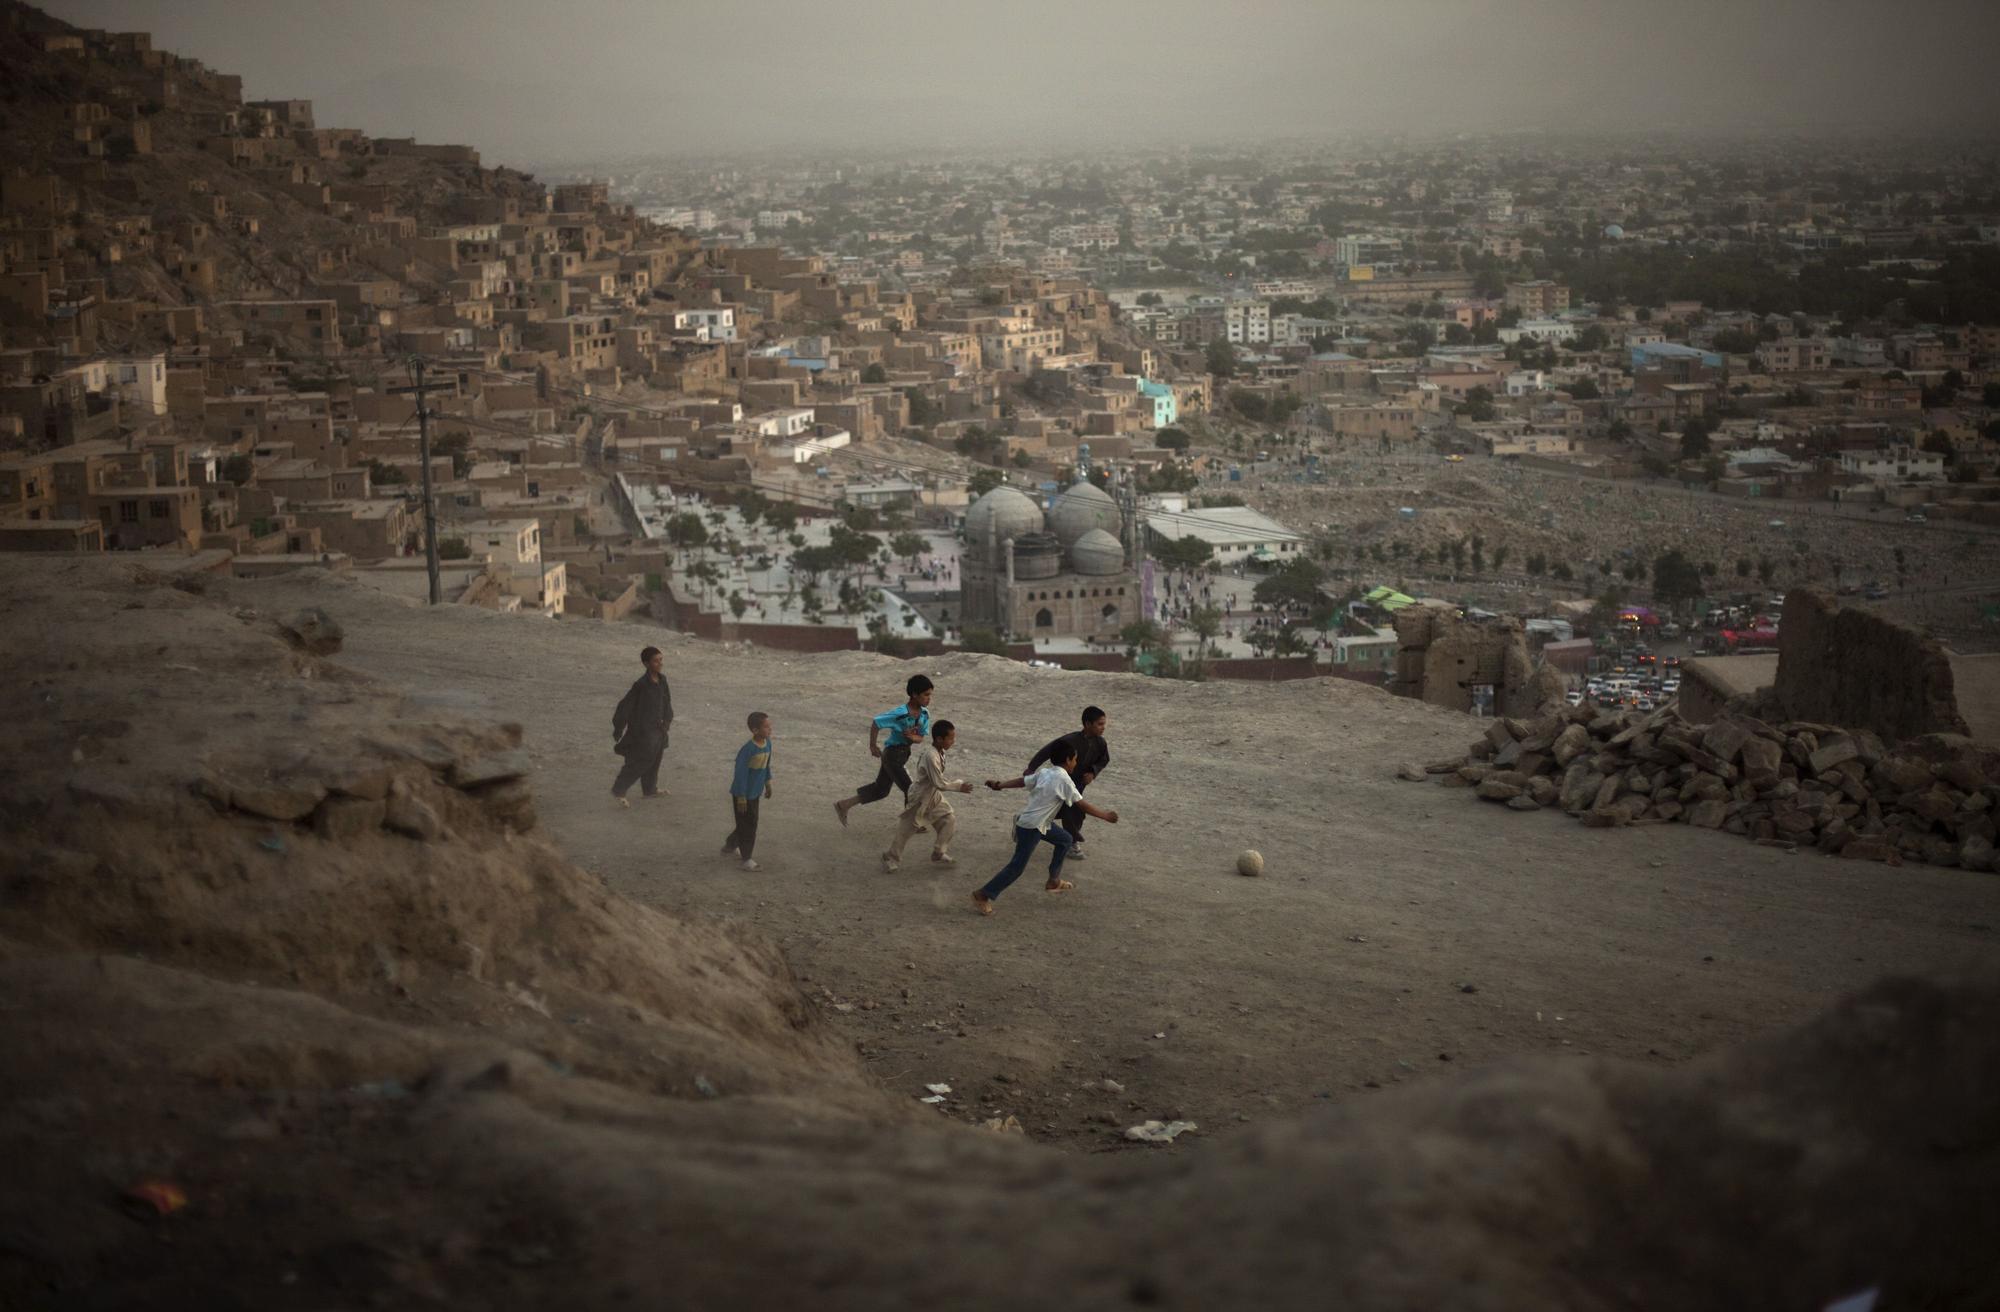 Afghan children play football in a street in Kabul, Afghanistan on Friday, July 17, 2009. (AP Photo/Emilio Morenatti)